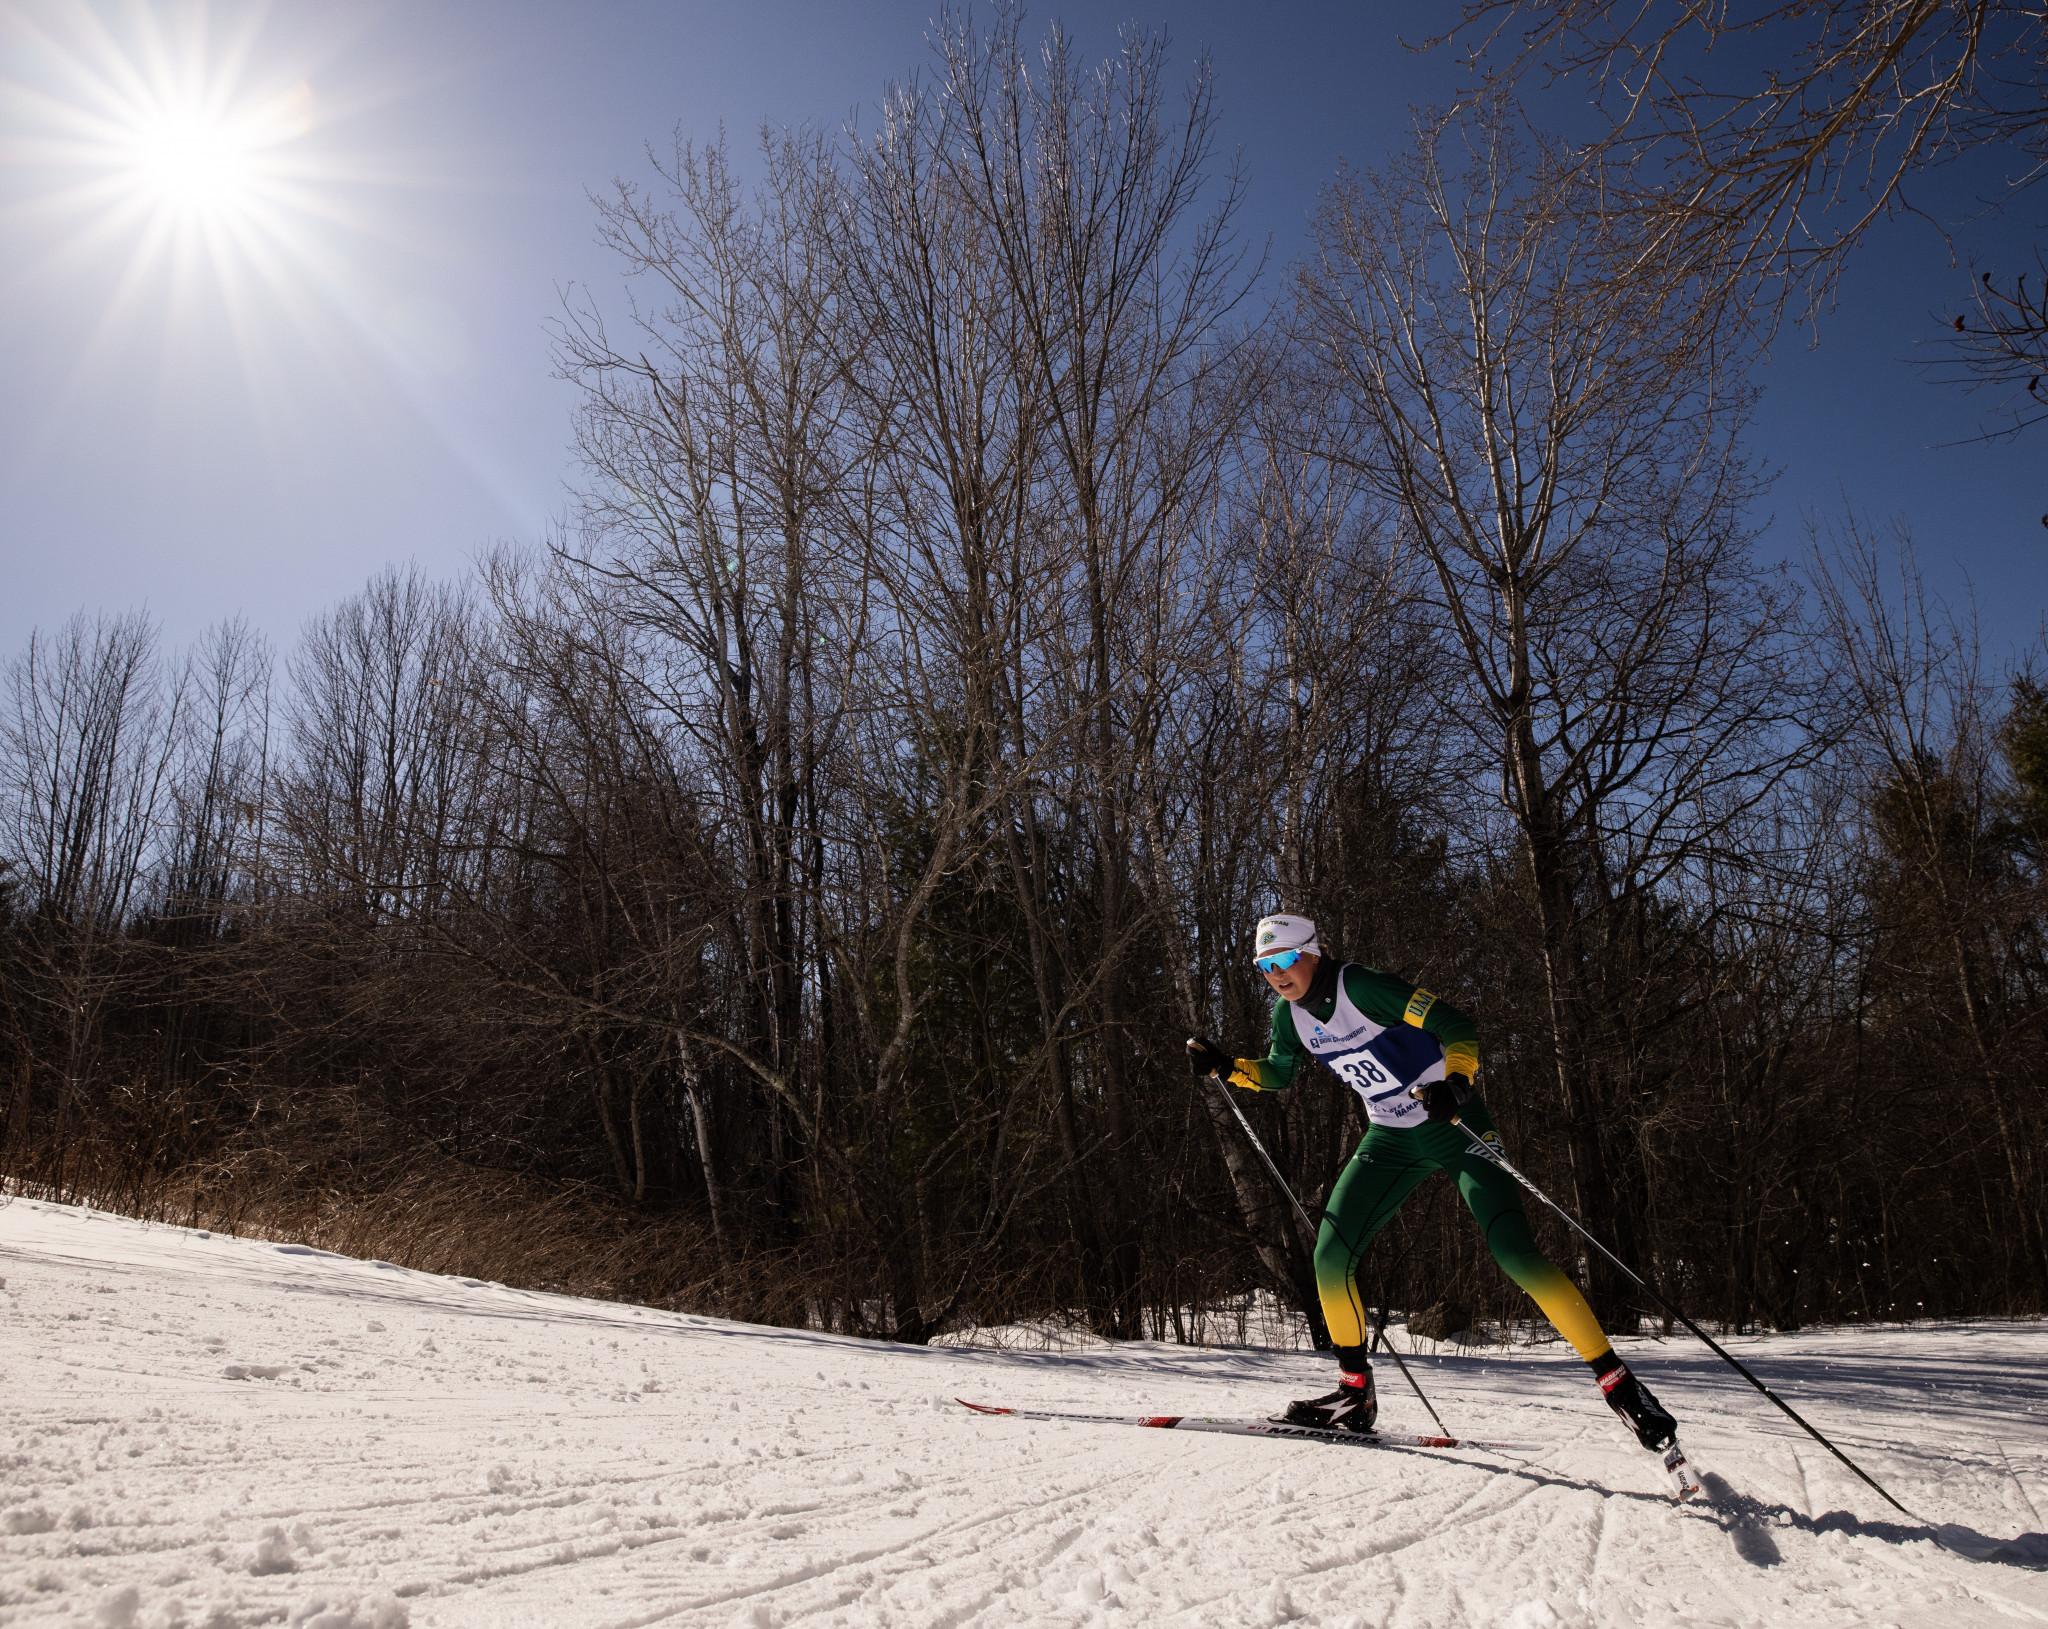 International Ski Federation set to establish long-term calendar framework for cross-country events